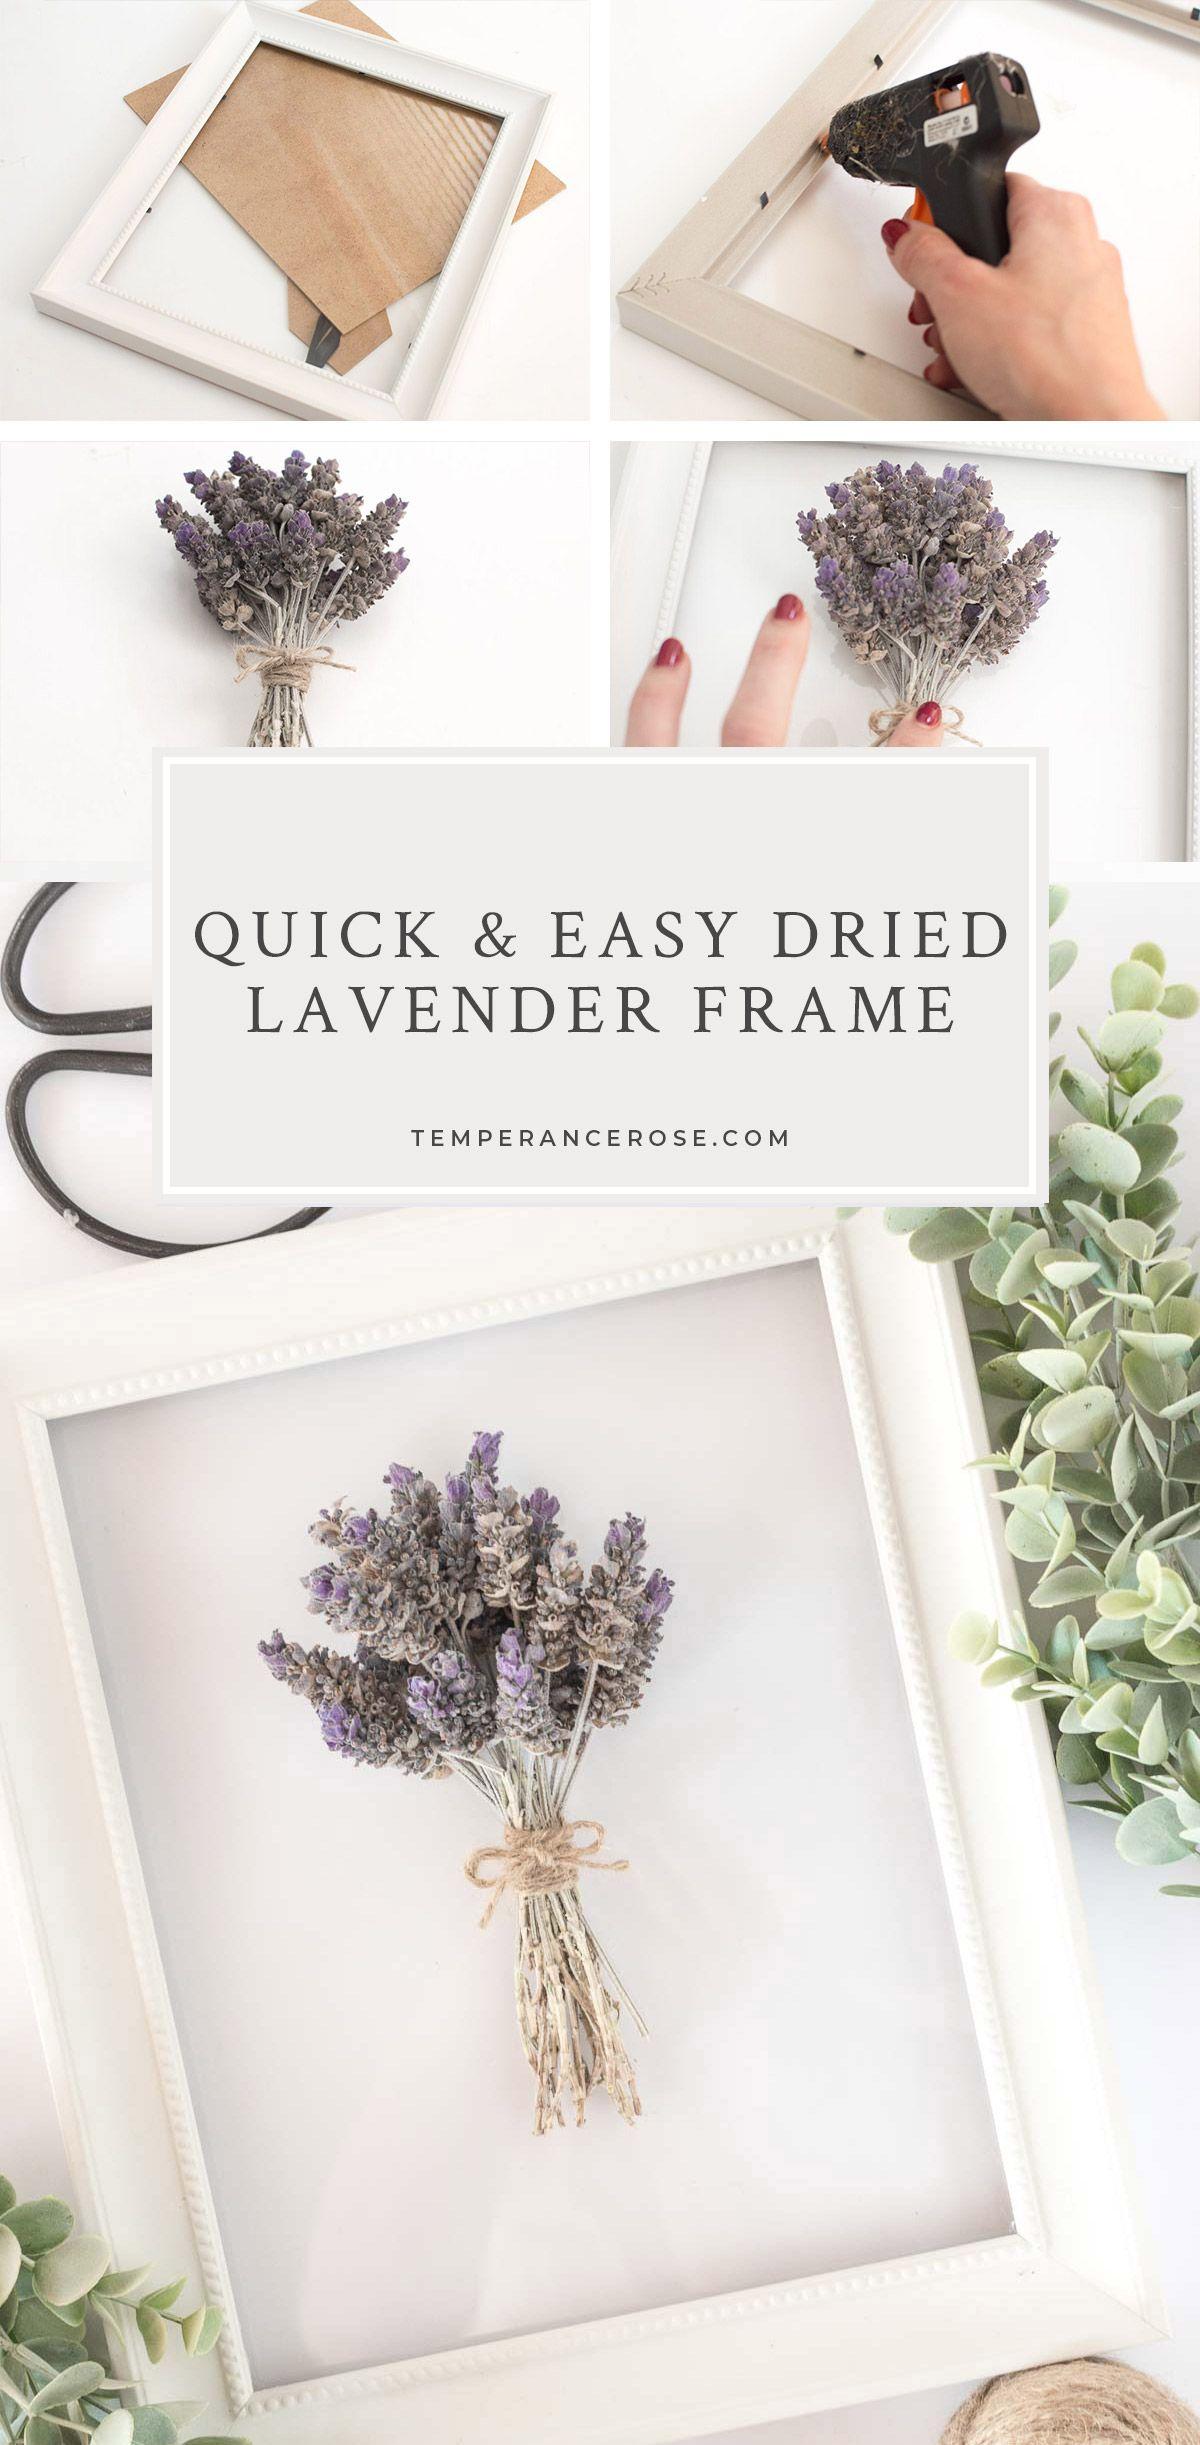 Diy Dried Lavender Frame Lavender Decor Spring Decor Dried Lavender